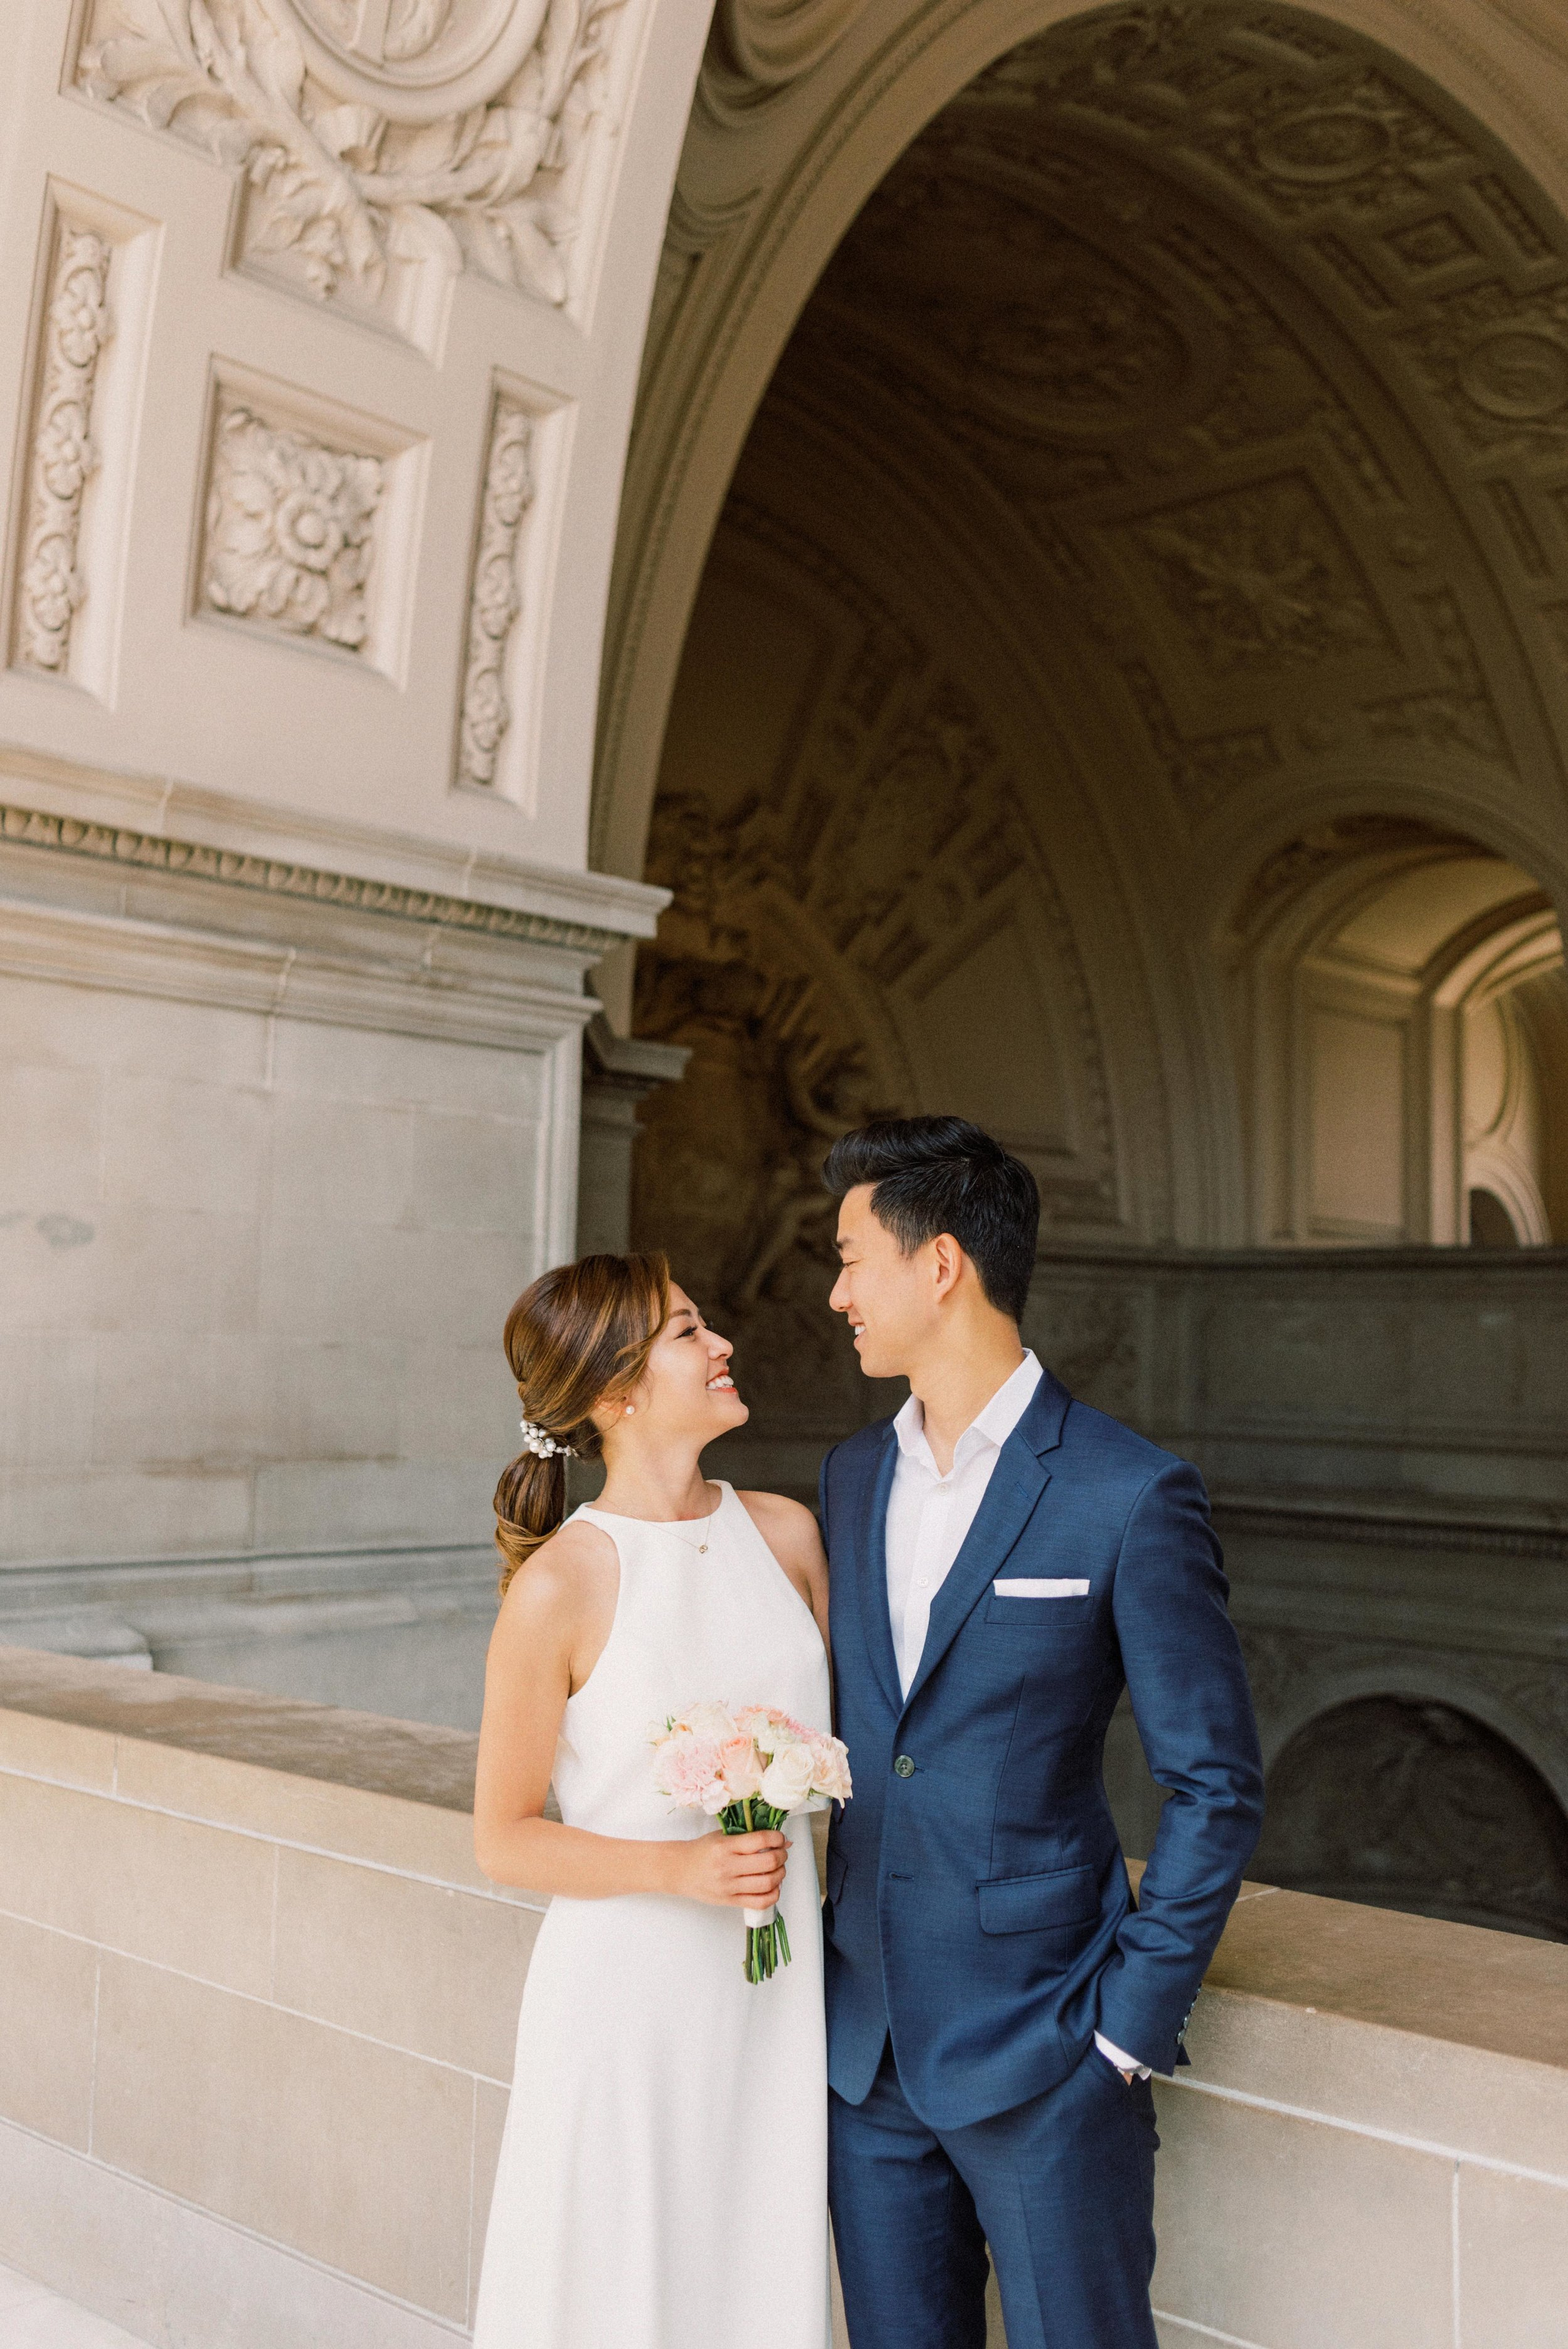 San-francisco-city-hall-photography-wedding-011.jpg